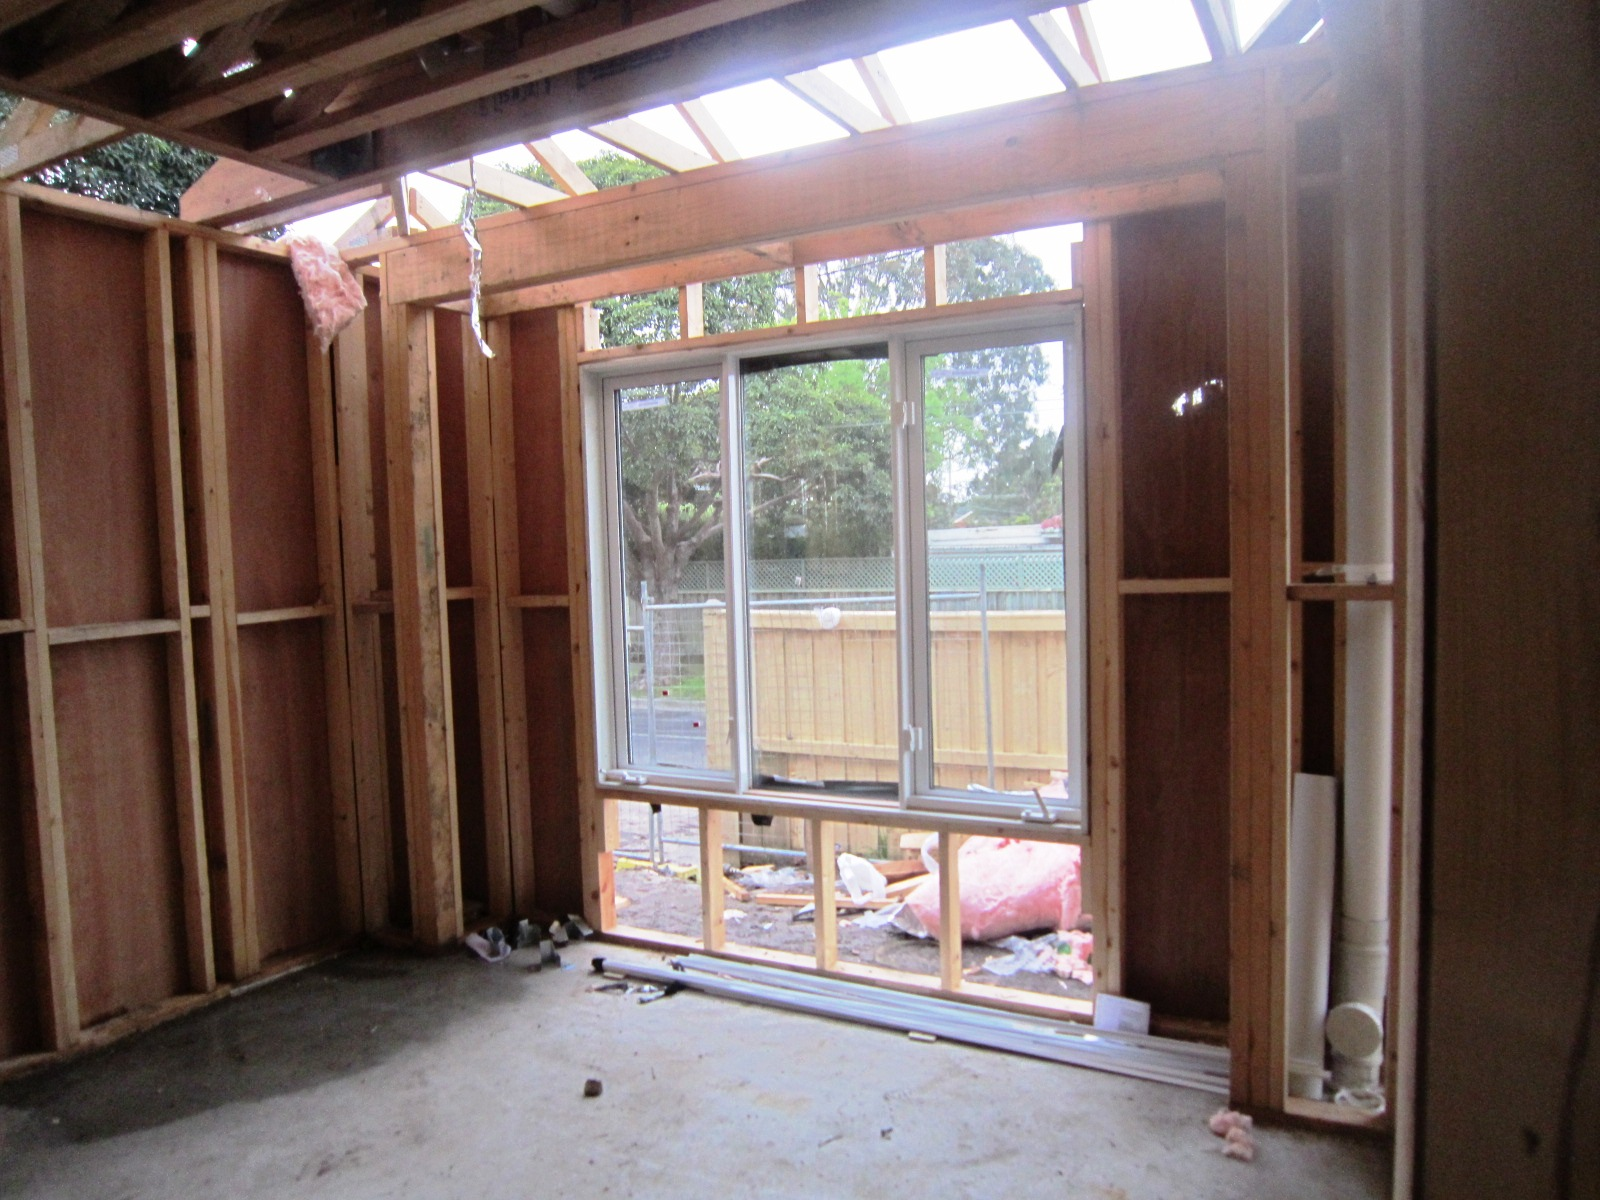 Ground Floor Window : Ground floor windows and french doors scarborough grove